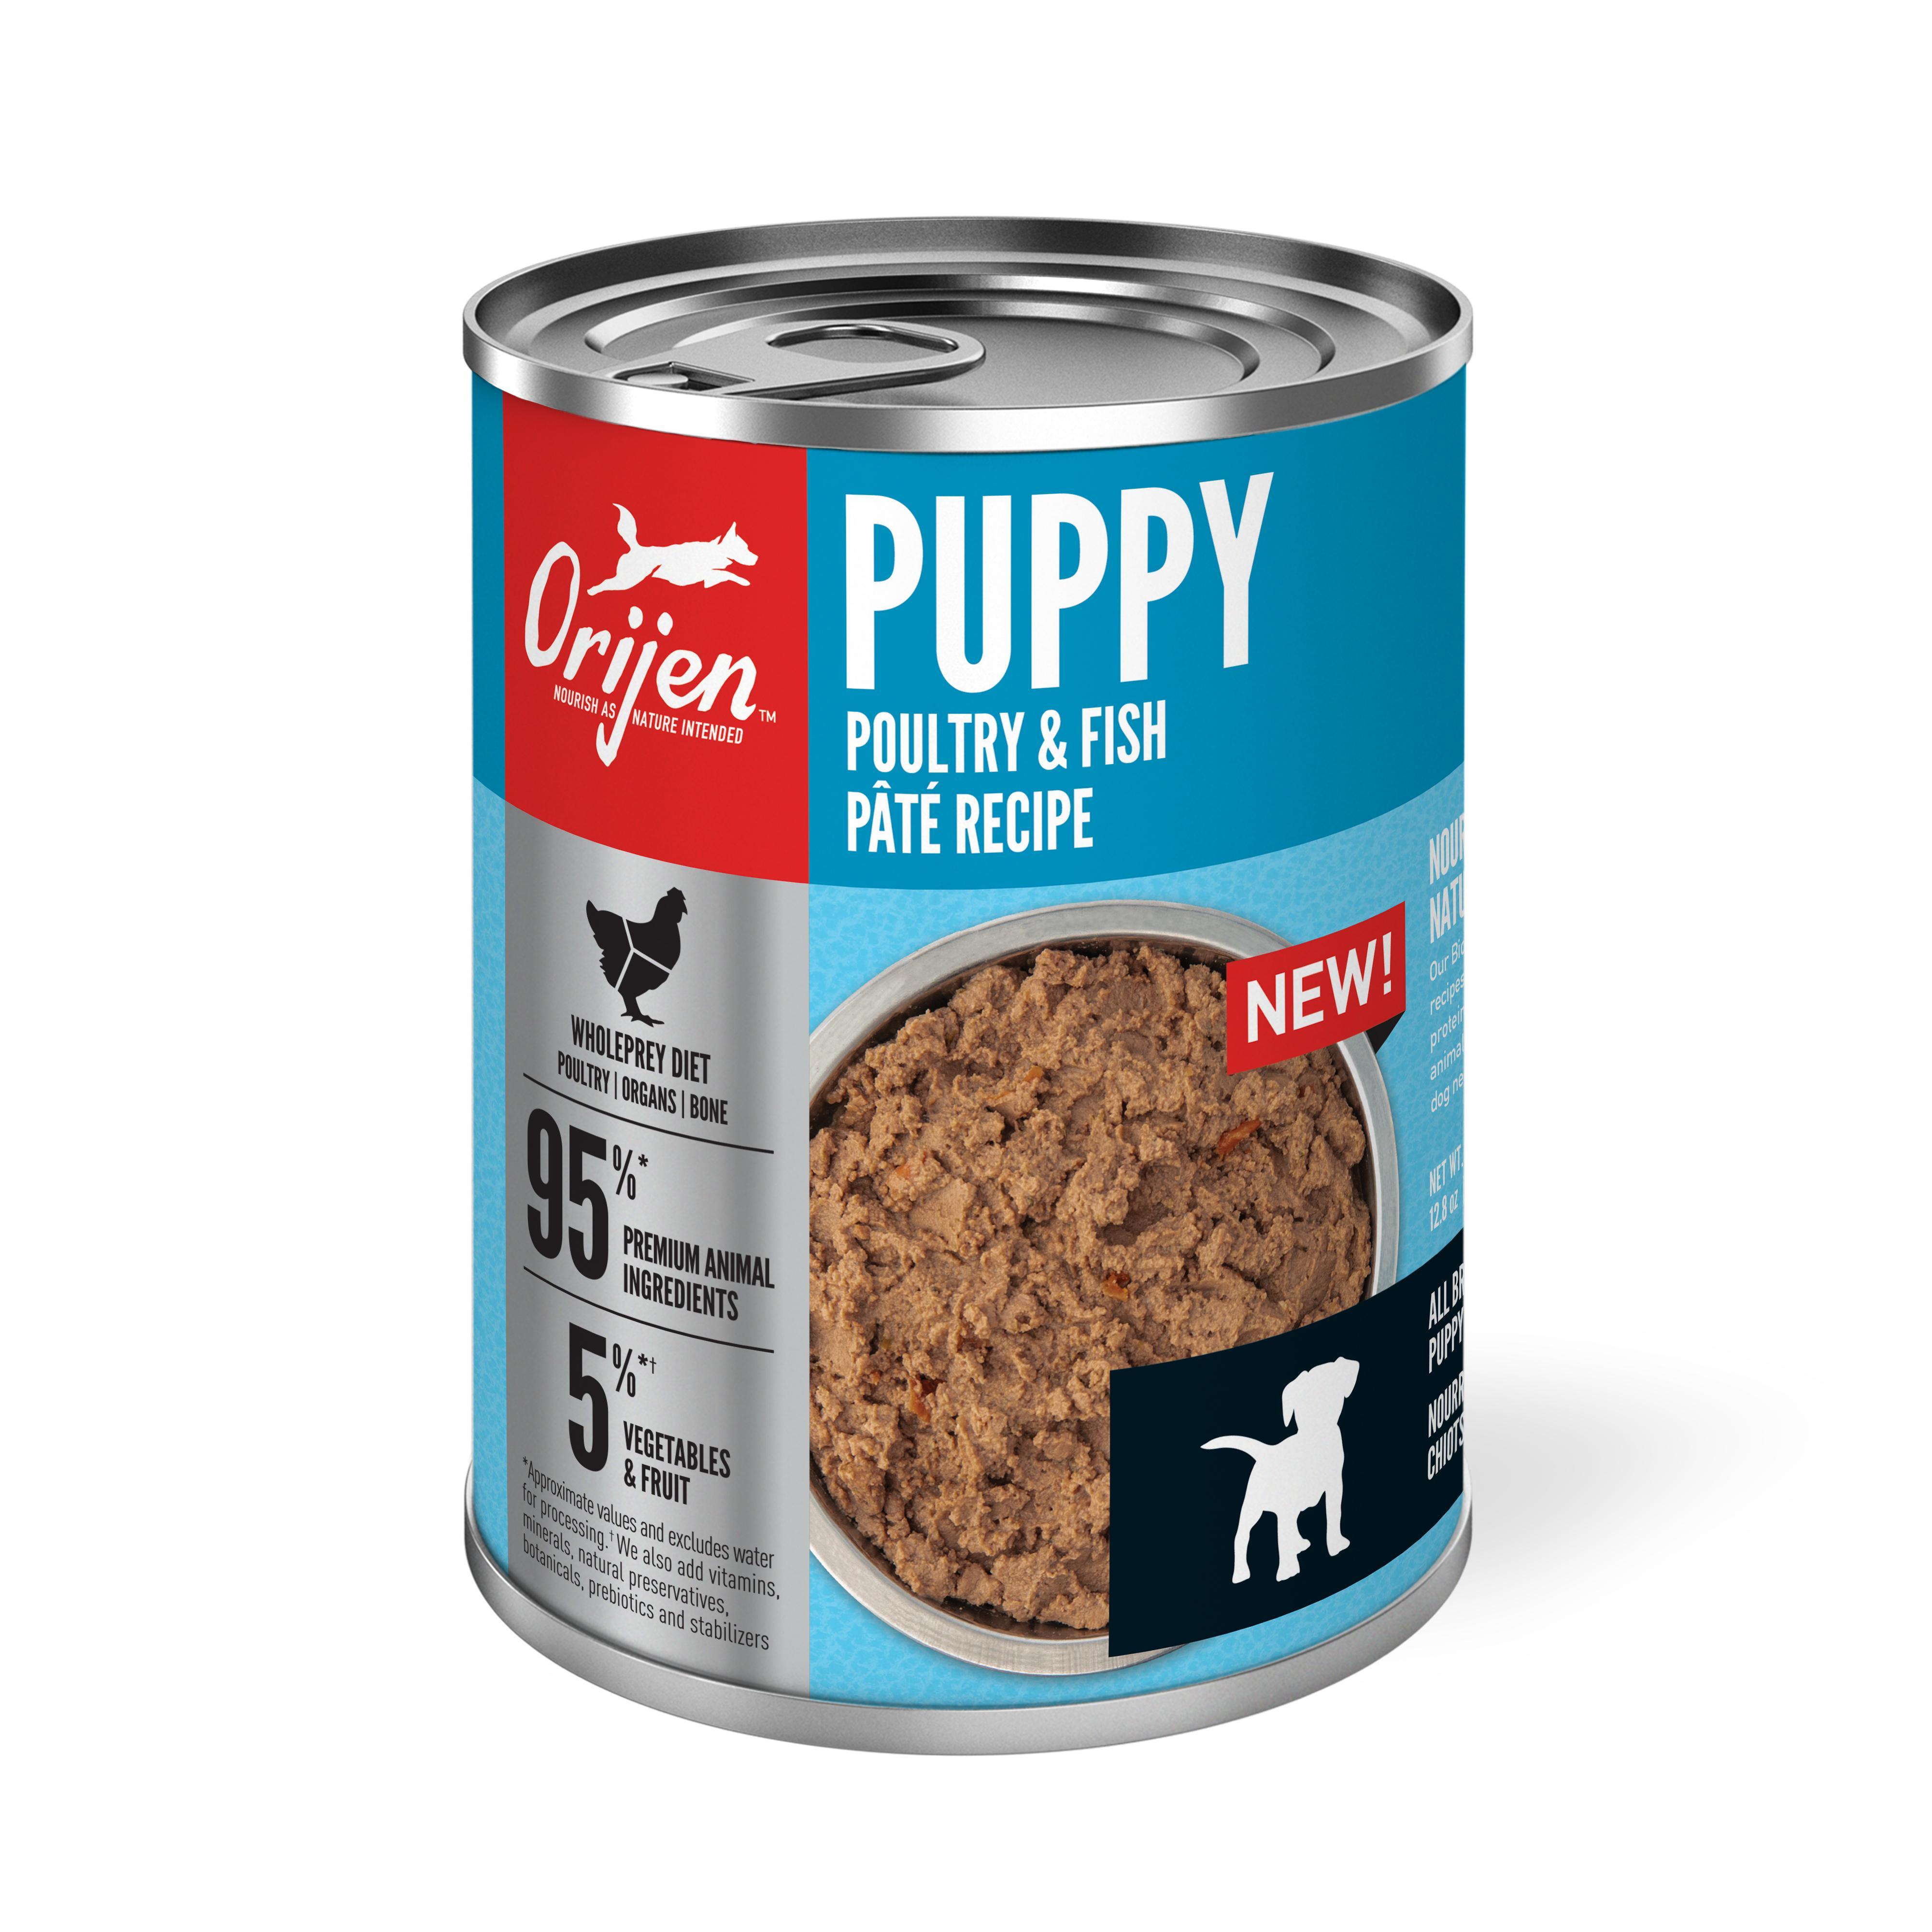 ORIJEN Puppy Poultry & Fish Pate Wet Dog Food Image